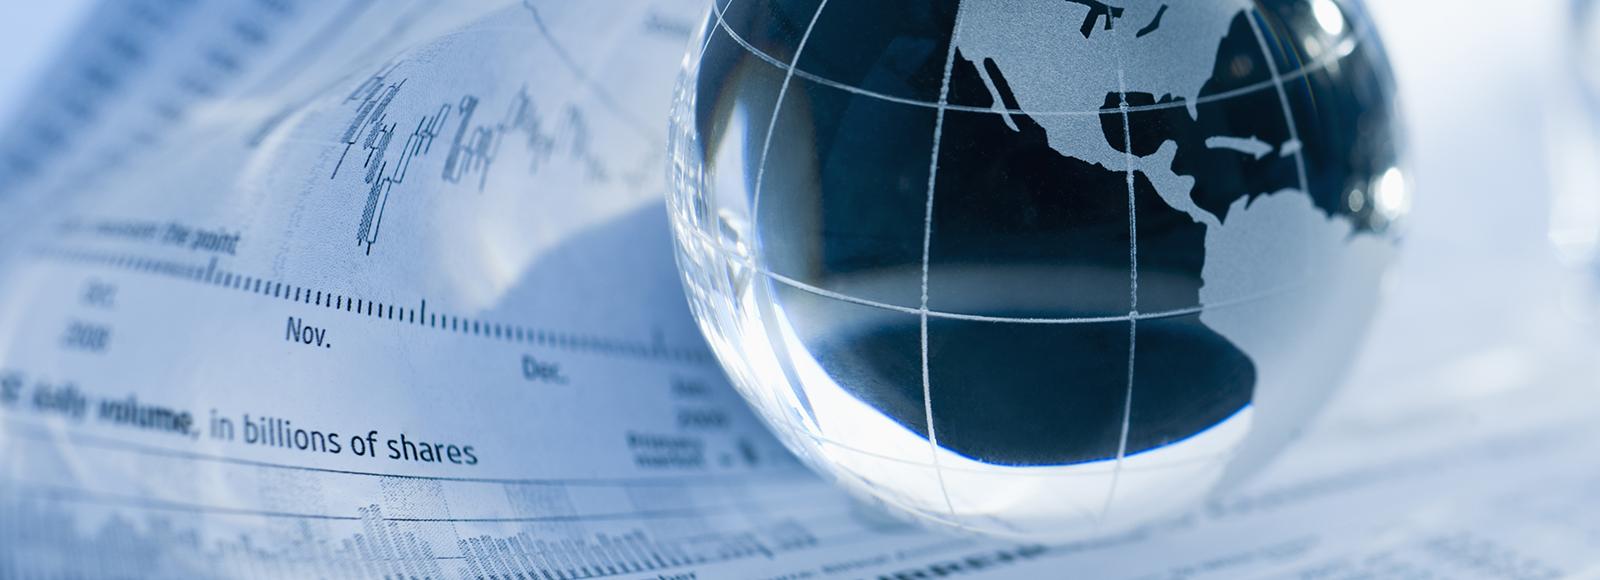 Emerging Markets Group